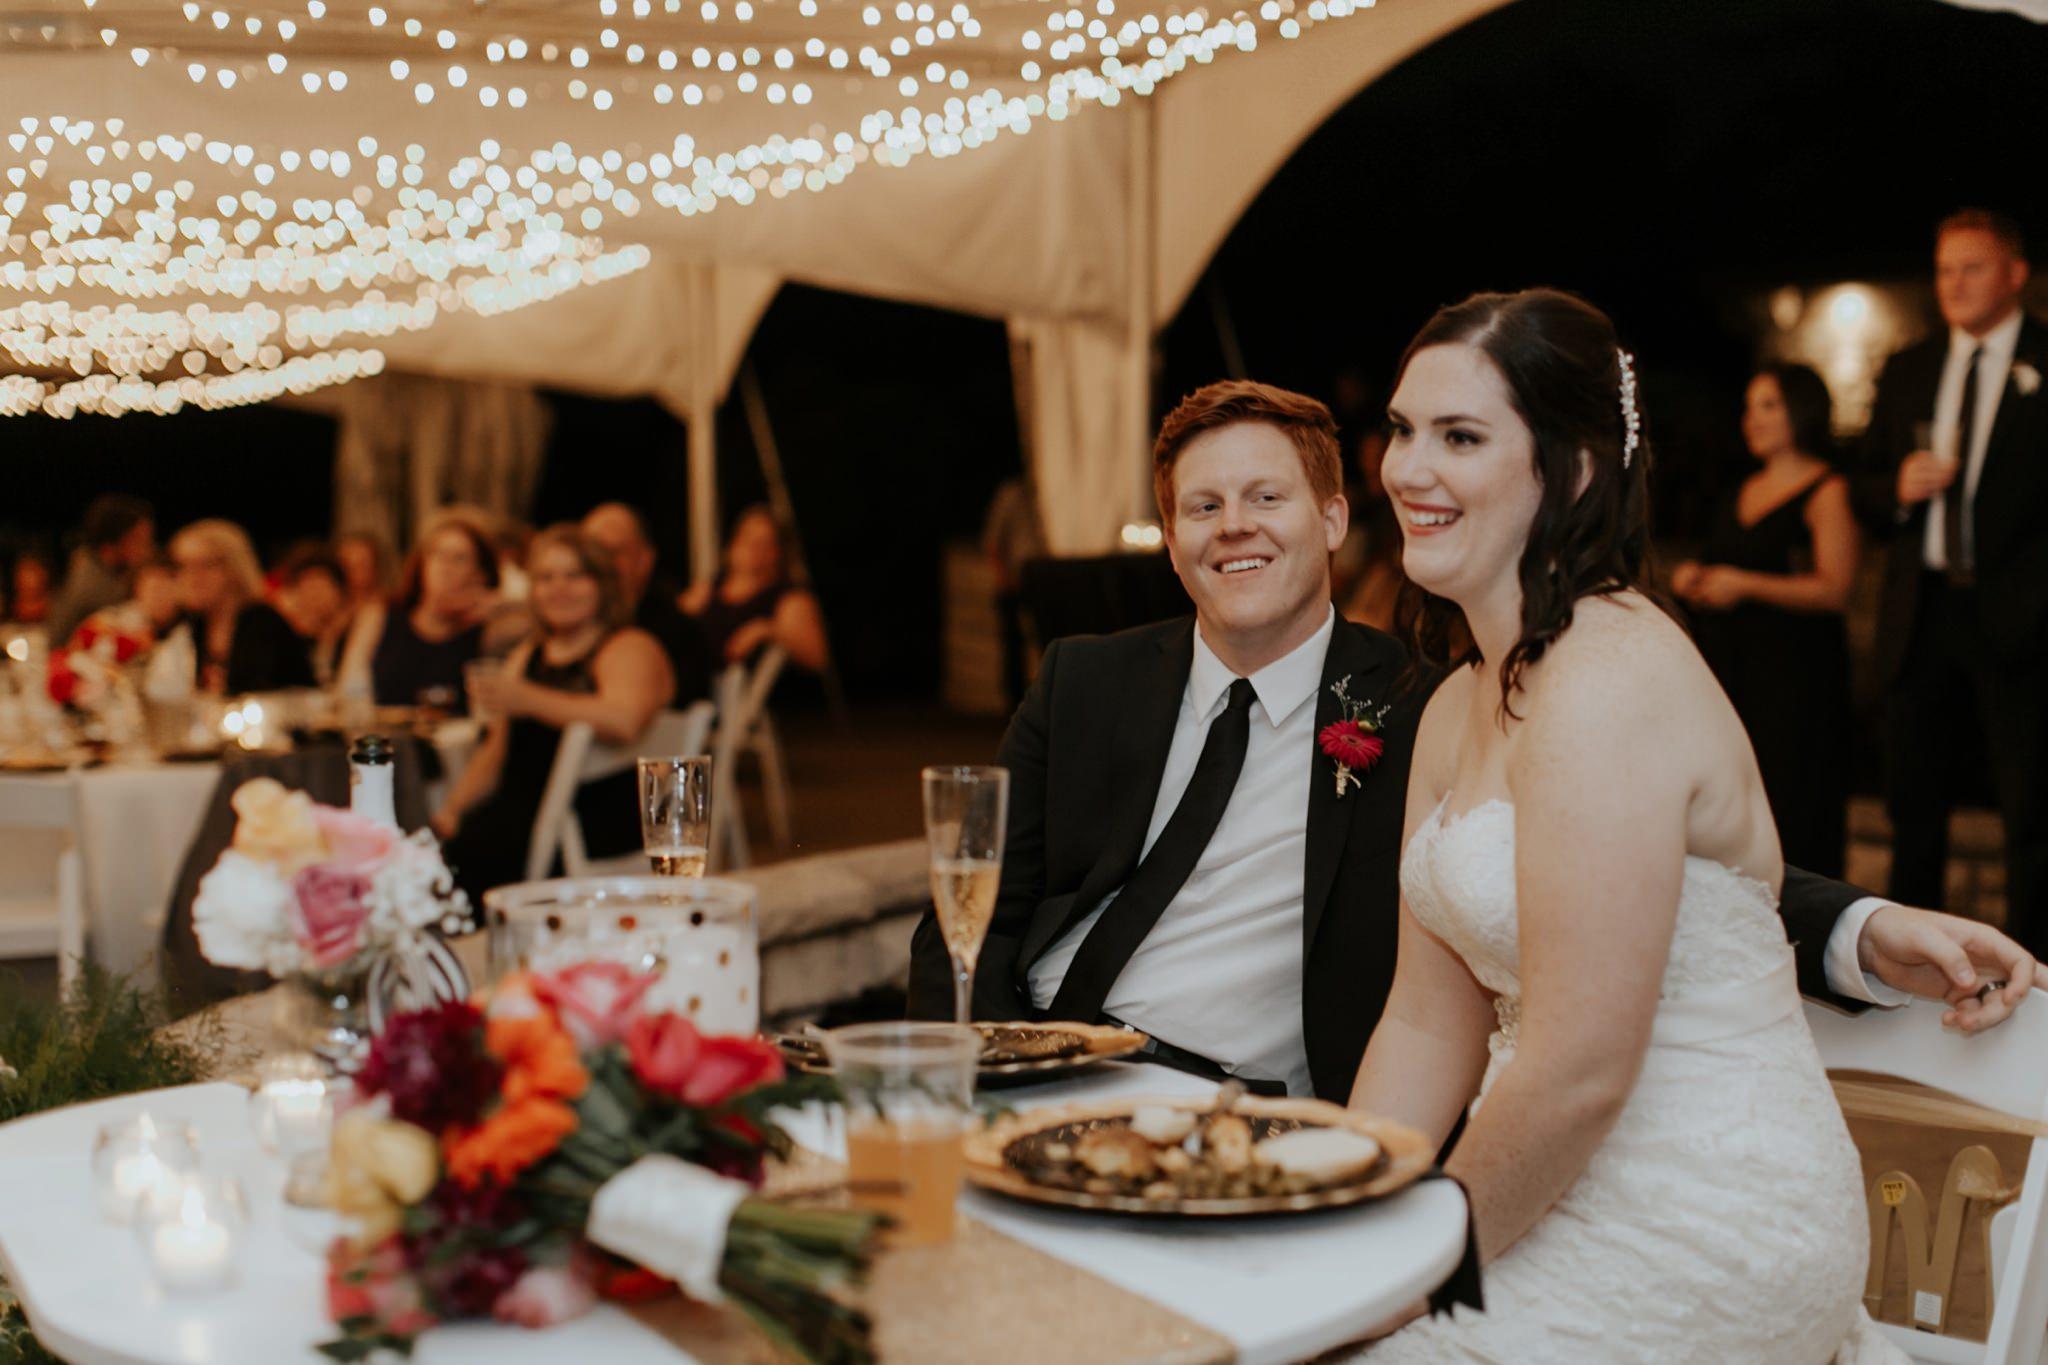 17-09-15 Lindsey and Brandon Wedding Edited-870_WEB.jpg